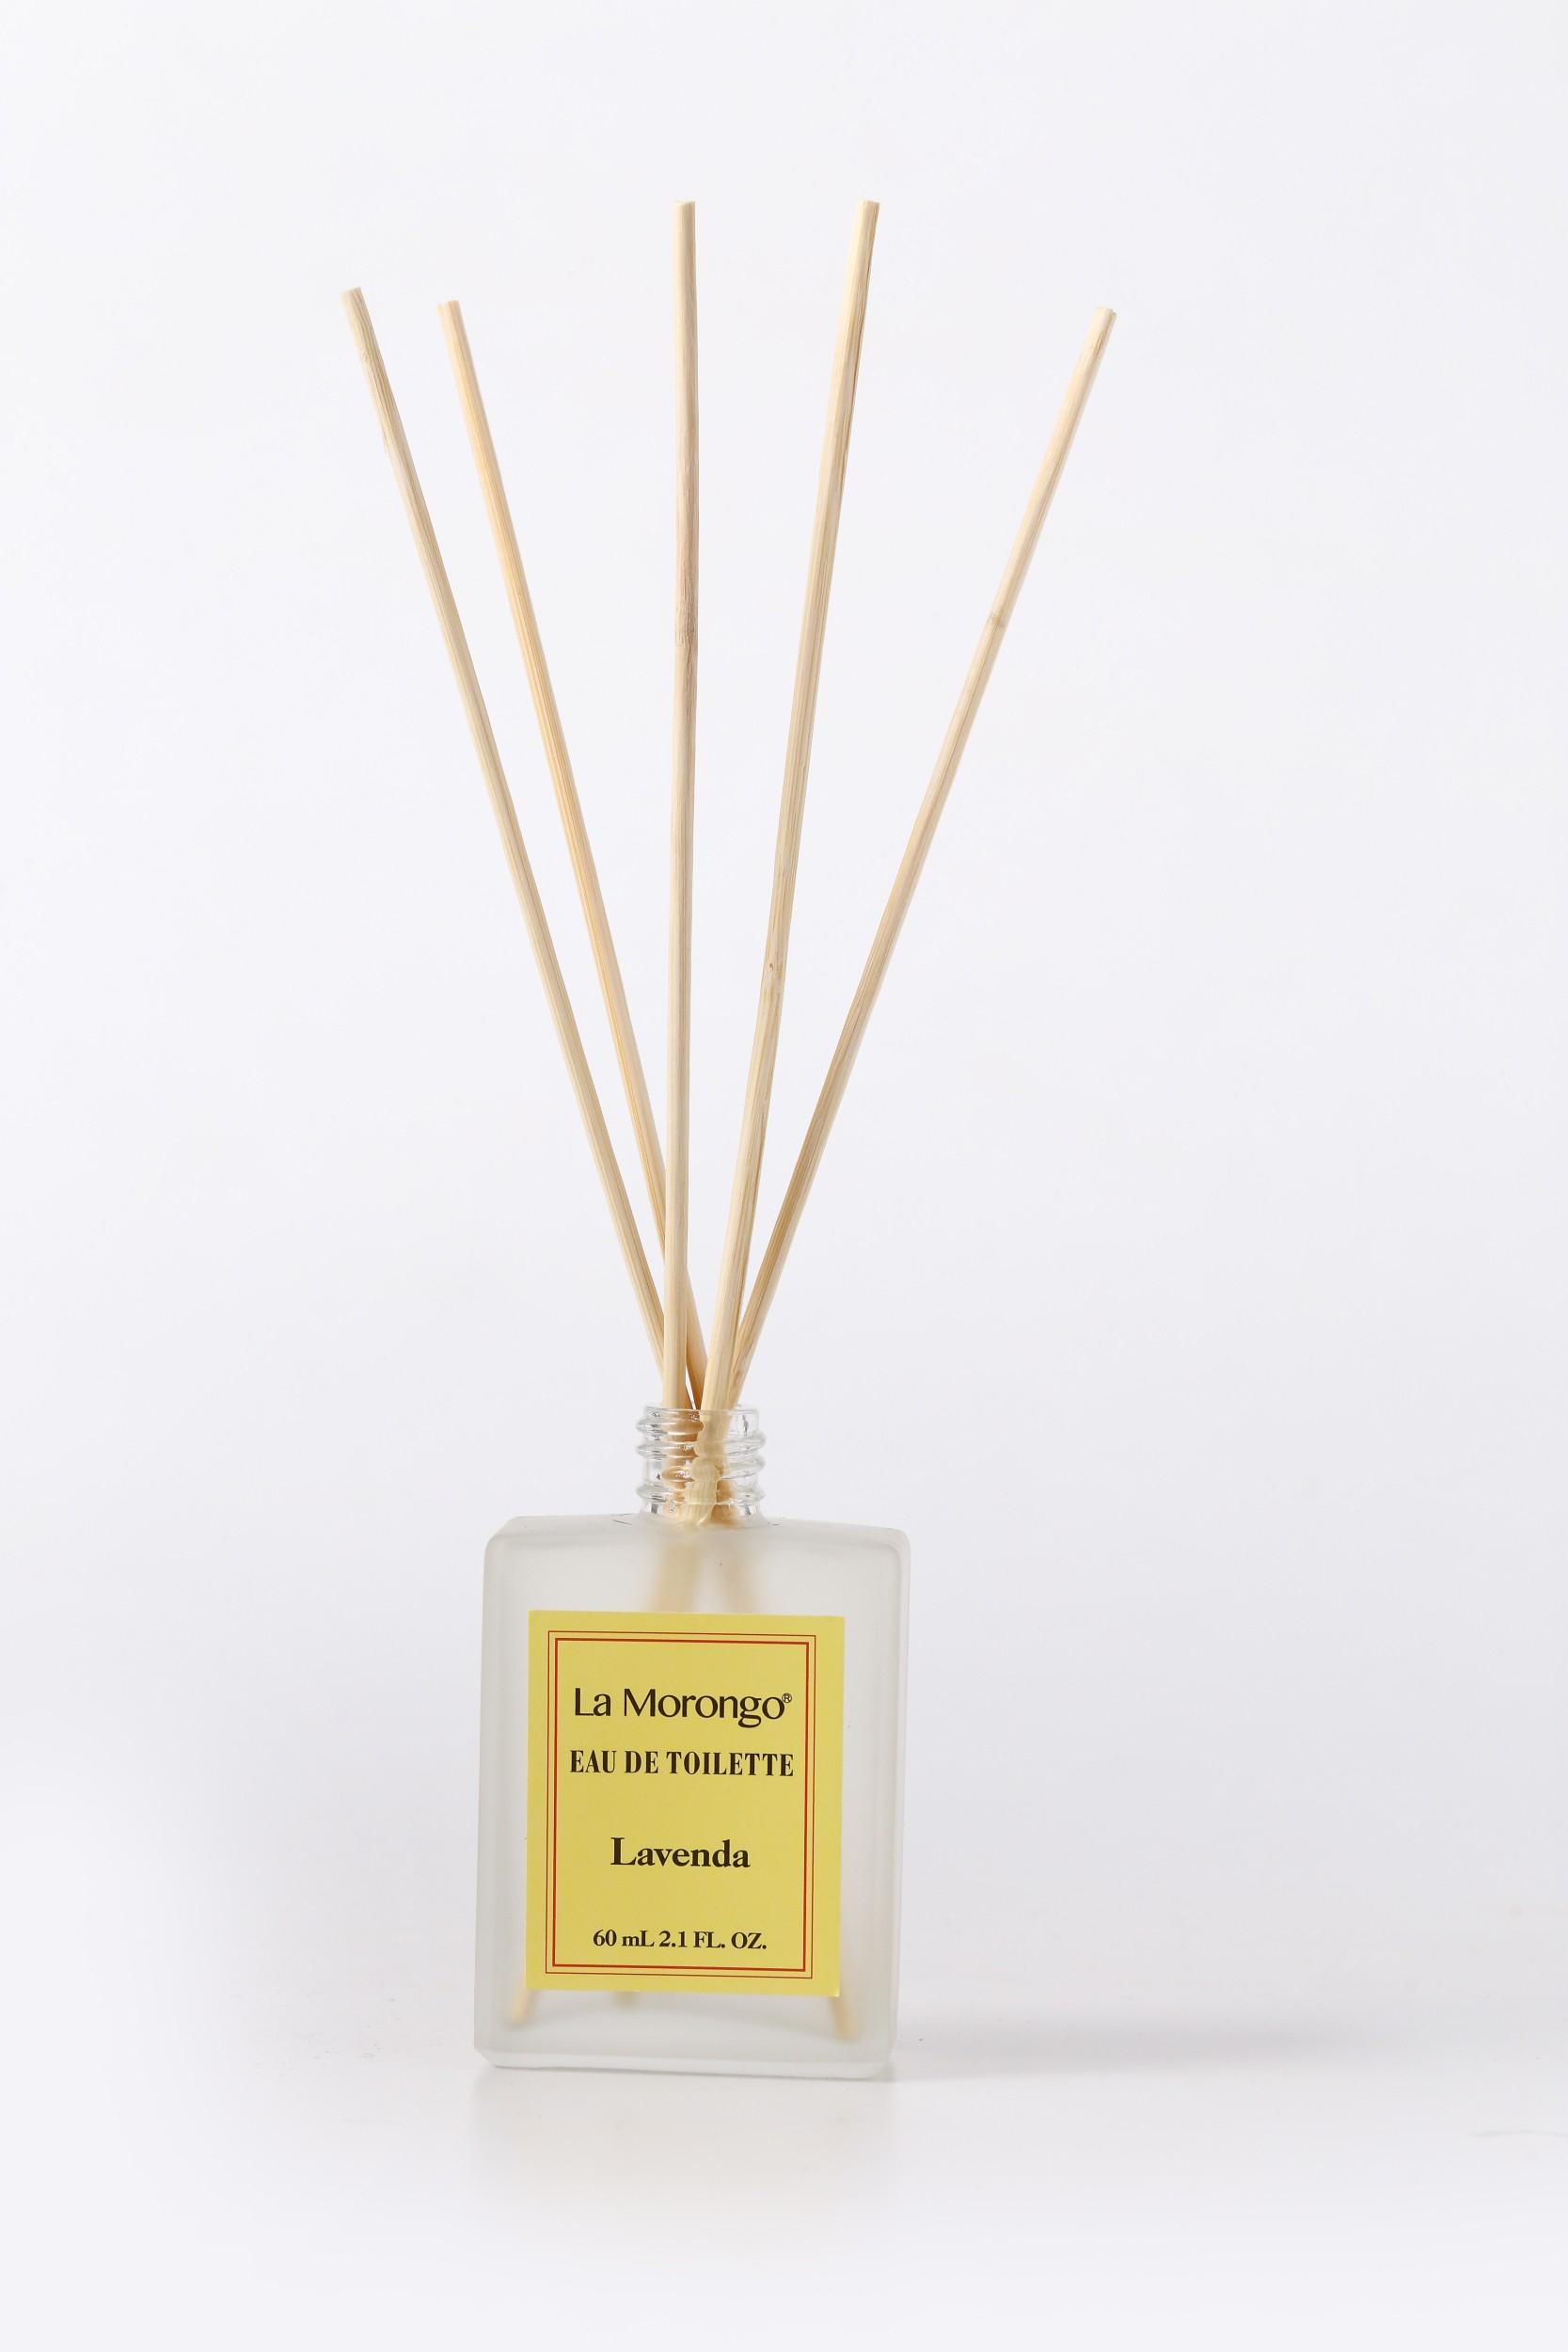 Lavenda bamboo reed diffuser 黃標普羅旺斯薰衣草精油香氛噴霧擴香竹 60mL